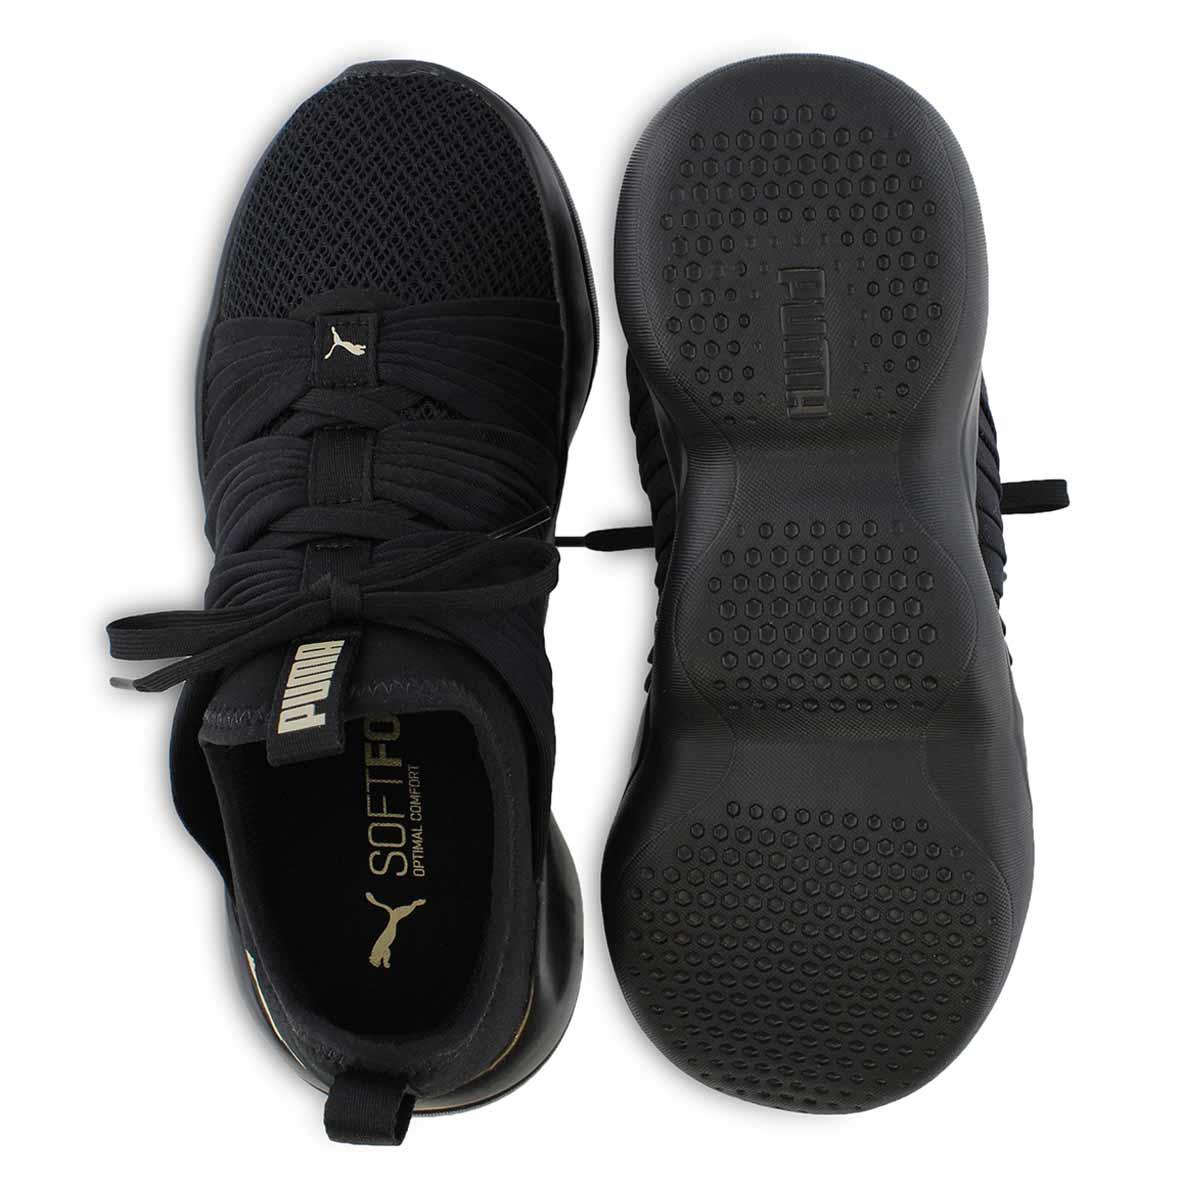 Lds Flourish blk/gld slip on sneaker